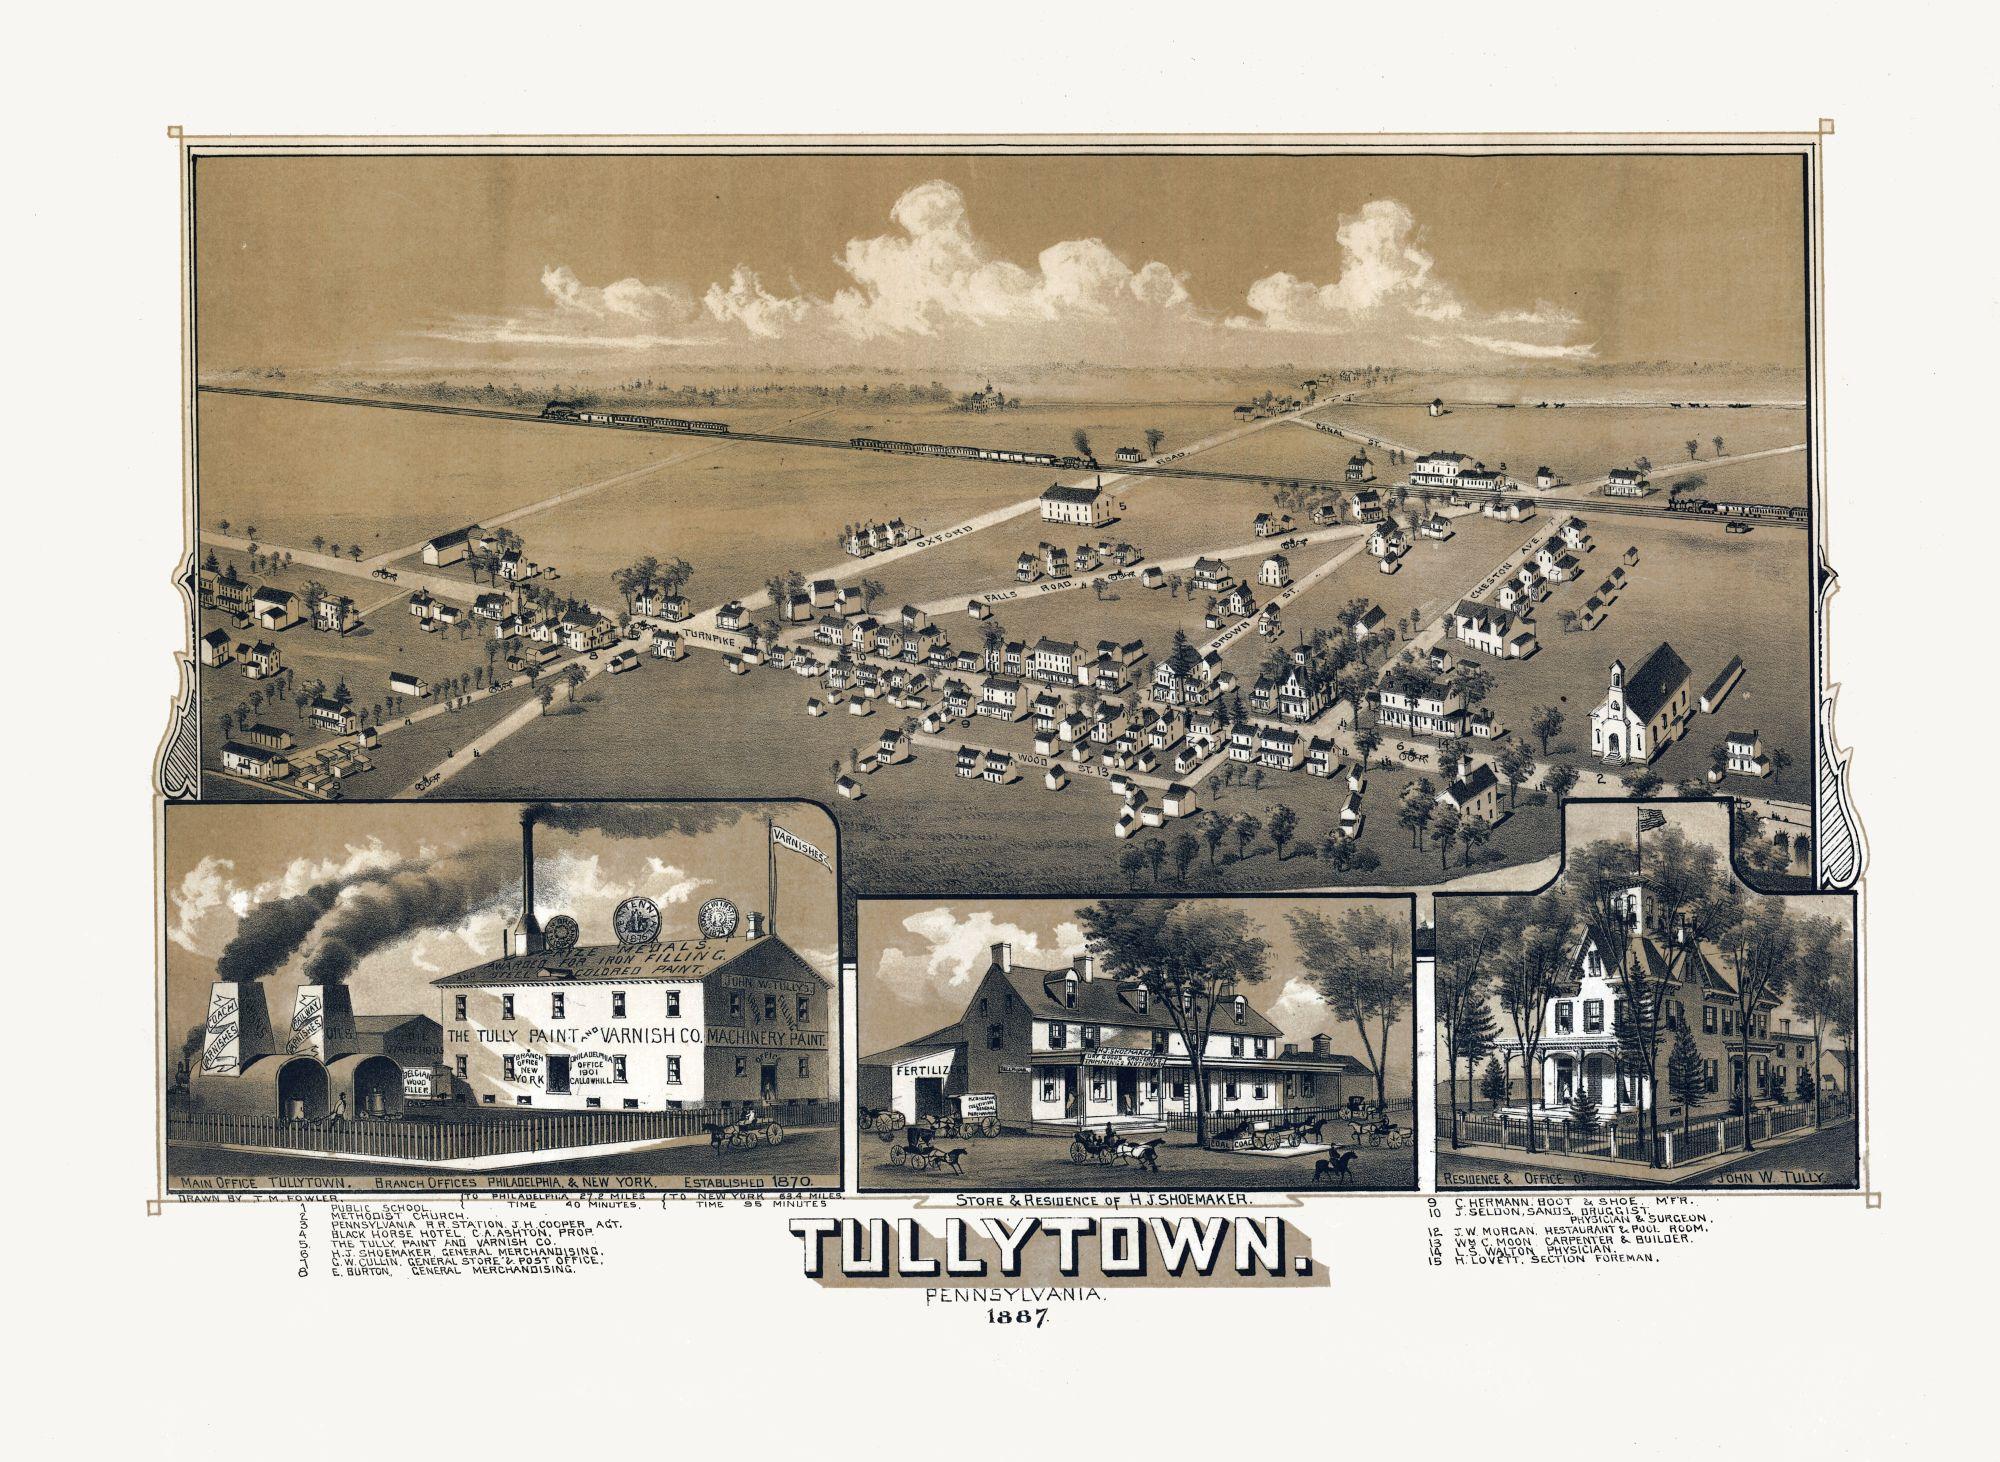 Tullytown Pennsylvania Fowler 1887 31 46 X 23 Walmart Com Walmart Com